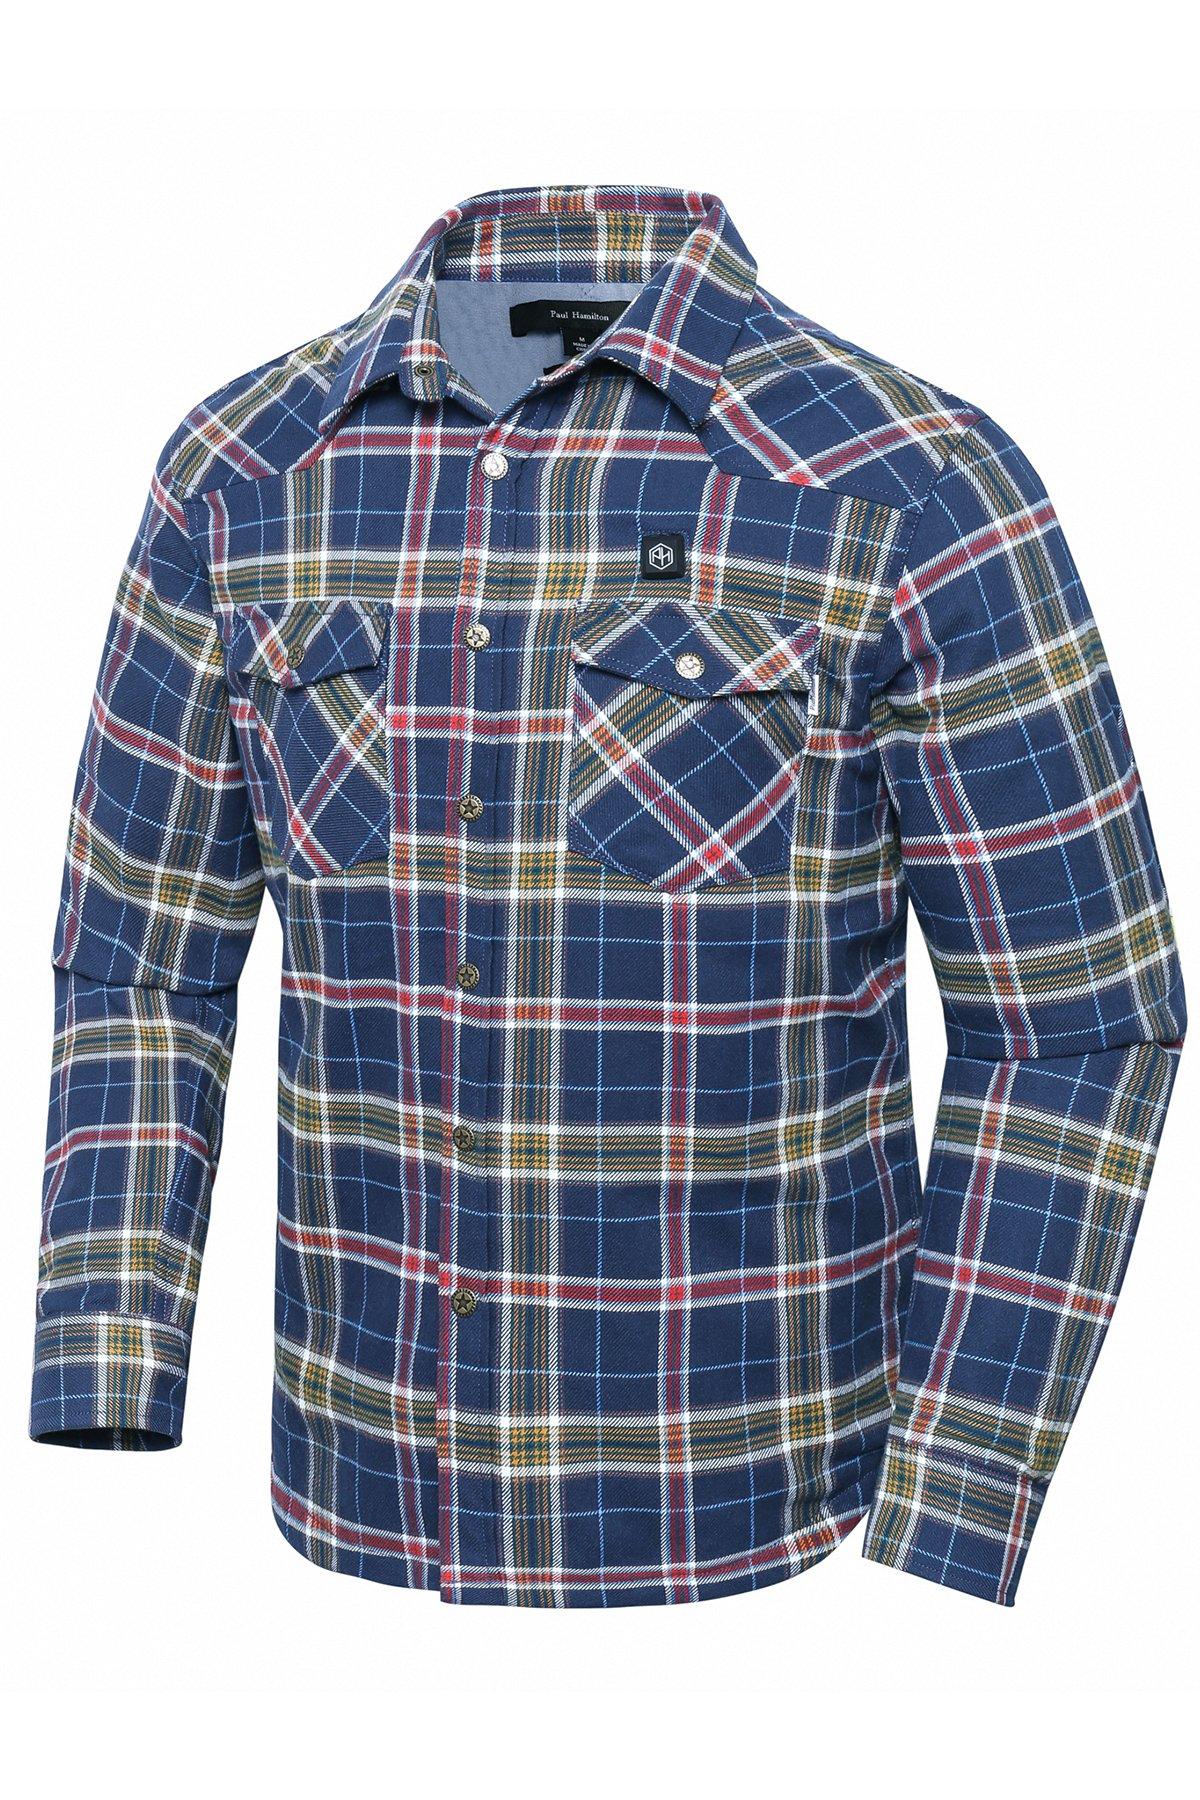 Pau1Hami1ton PJ-02 Men's Heated Jacket Heated Jackets for Men(M, Blue) by Pau1Hami1ton